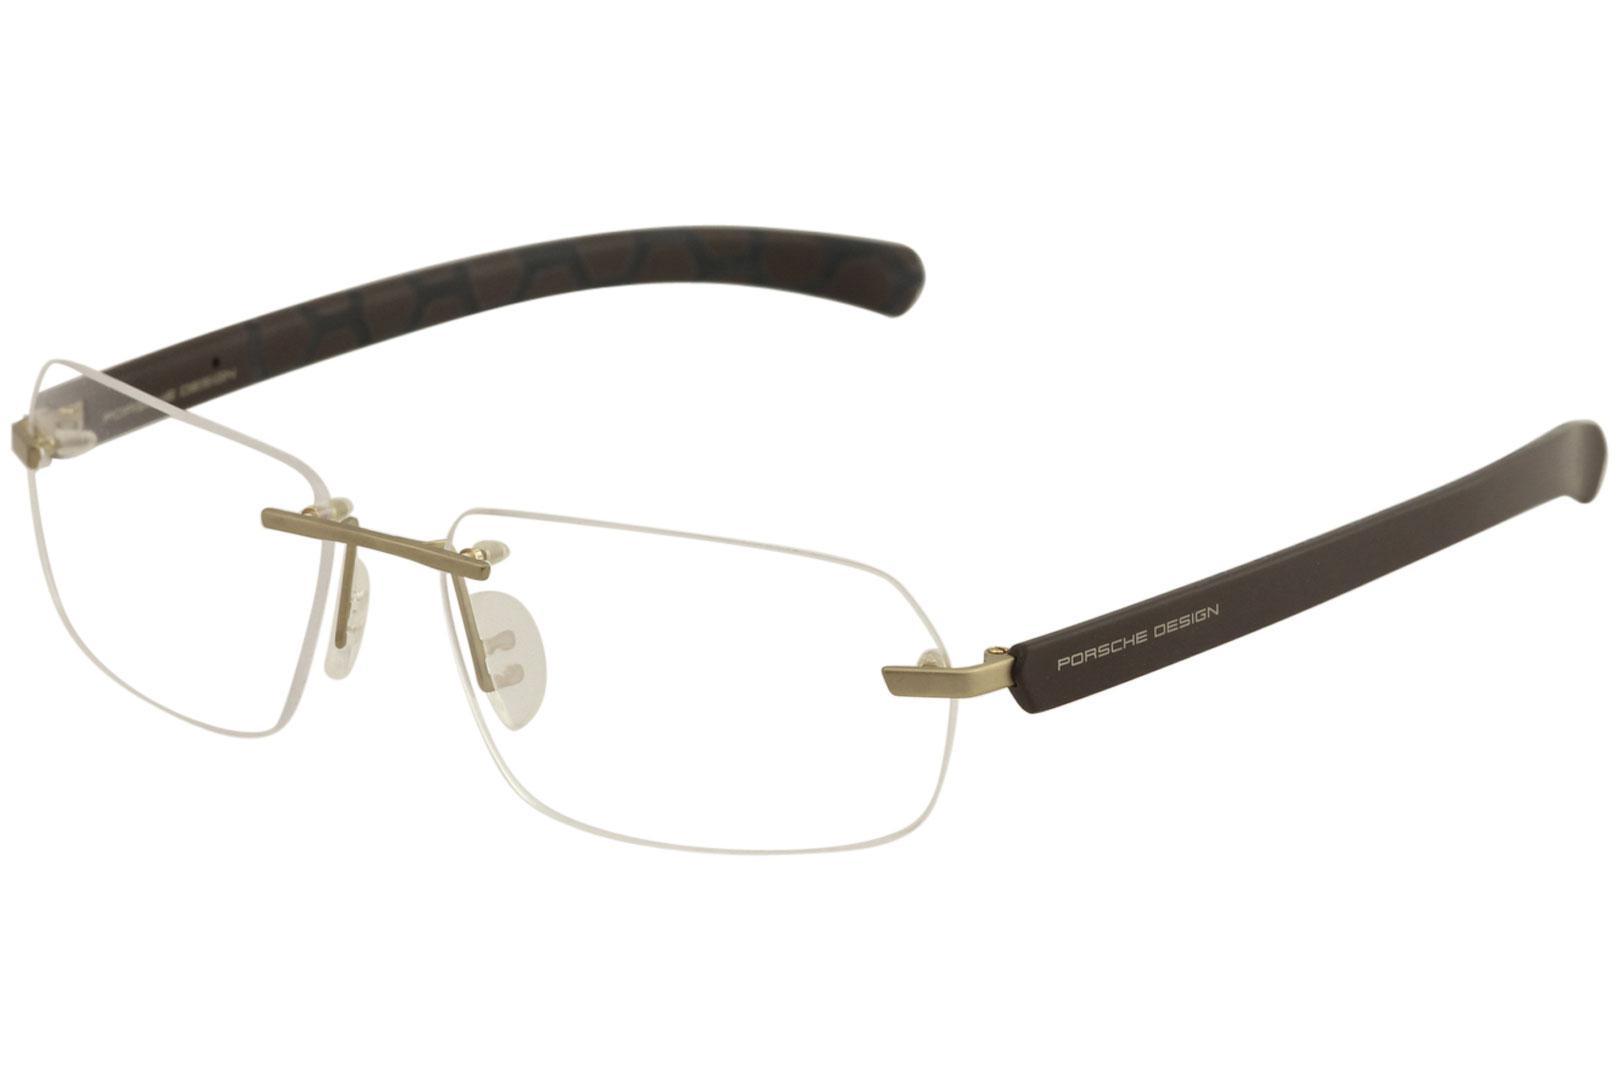 f0f729c3b0 Porsche Design Men s Eyeglasses P8202 P 8202 Rimless Titanium Optical Frame  by Porsche Design. Touch to zoom